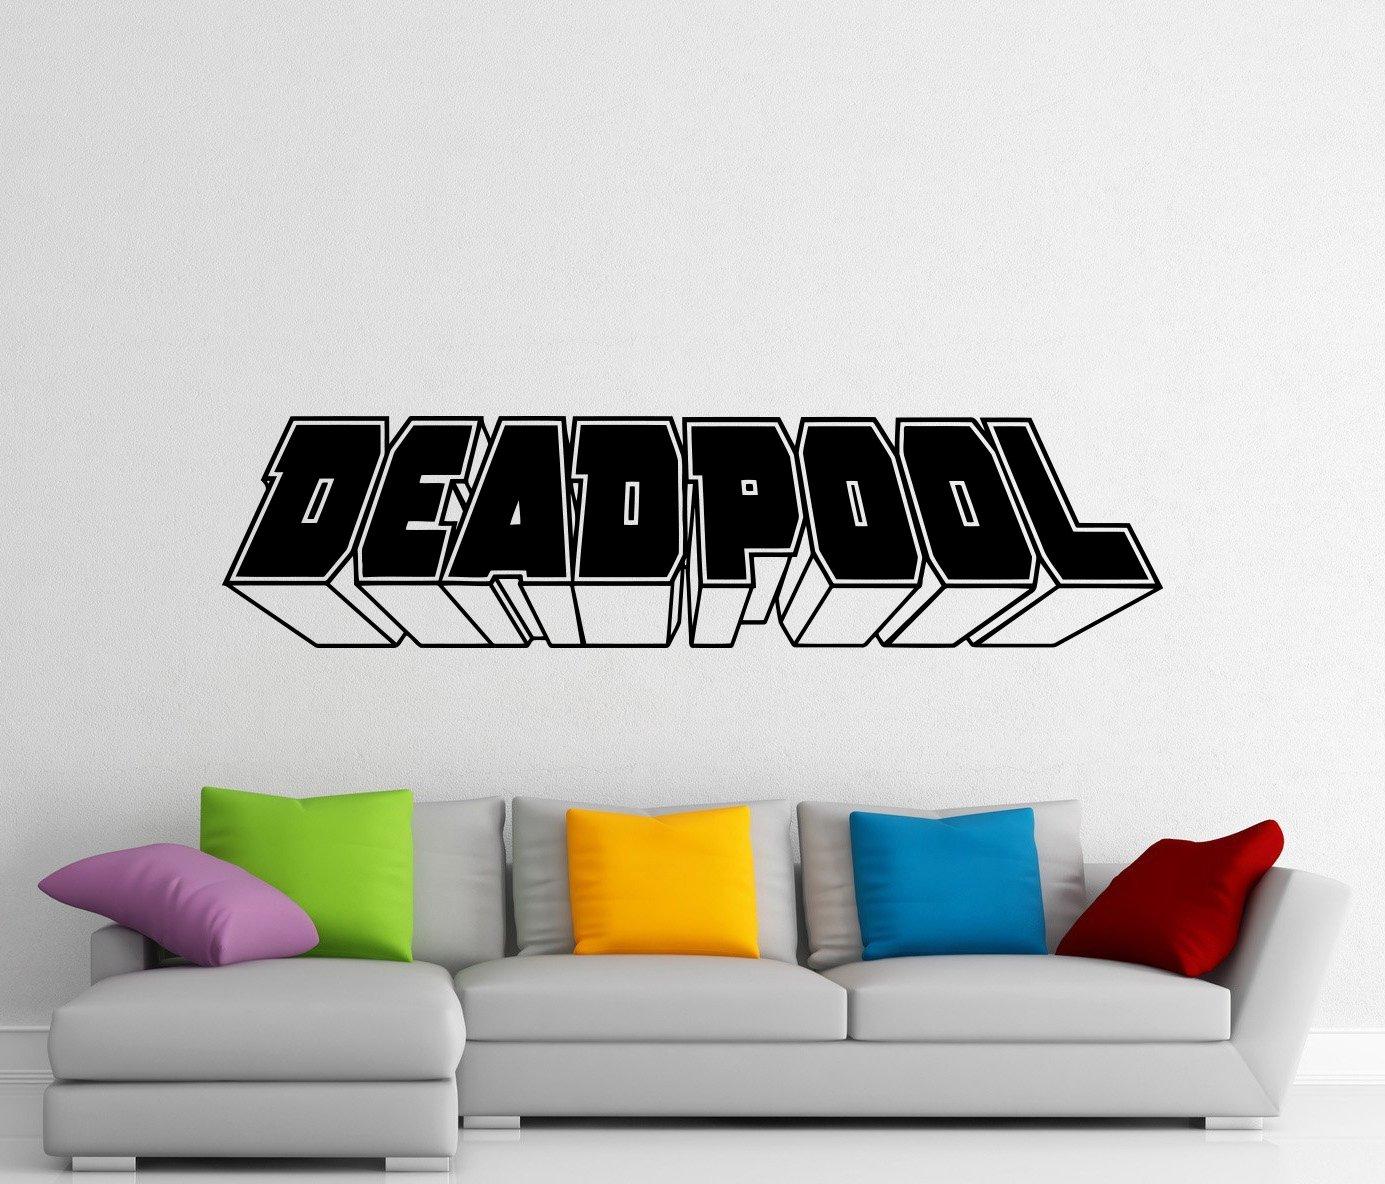 Deadpool Word Wall Decal Deadpool Logo Comics Movie Superhero Vinyl Sticker Kids Room Nursery Wall Decor Waterproof Mural (433z)